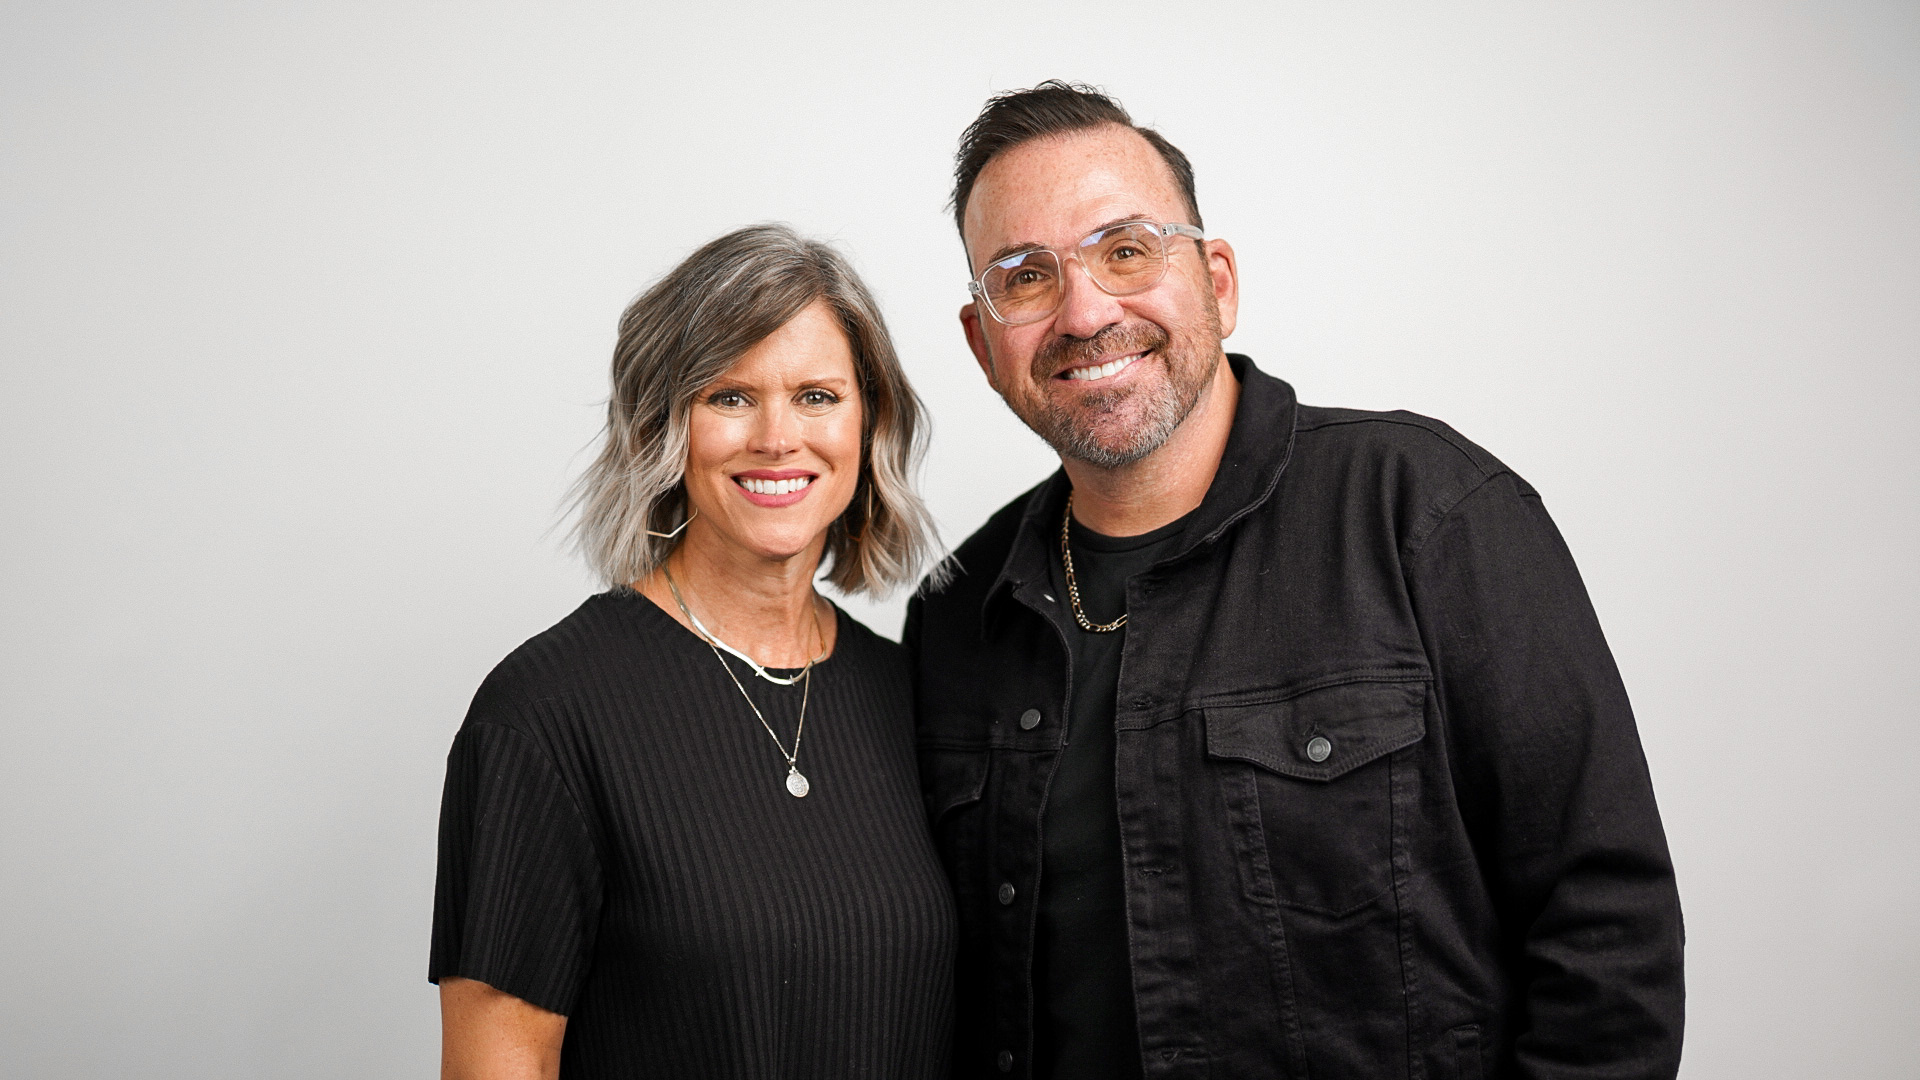 Pastor Jim and Dawn Raley